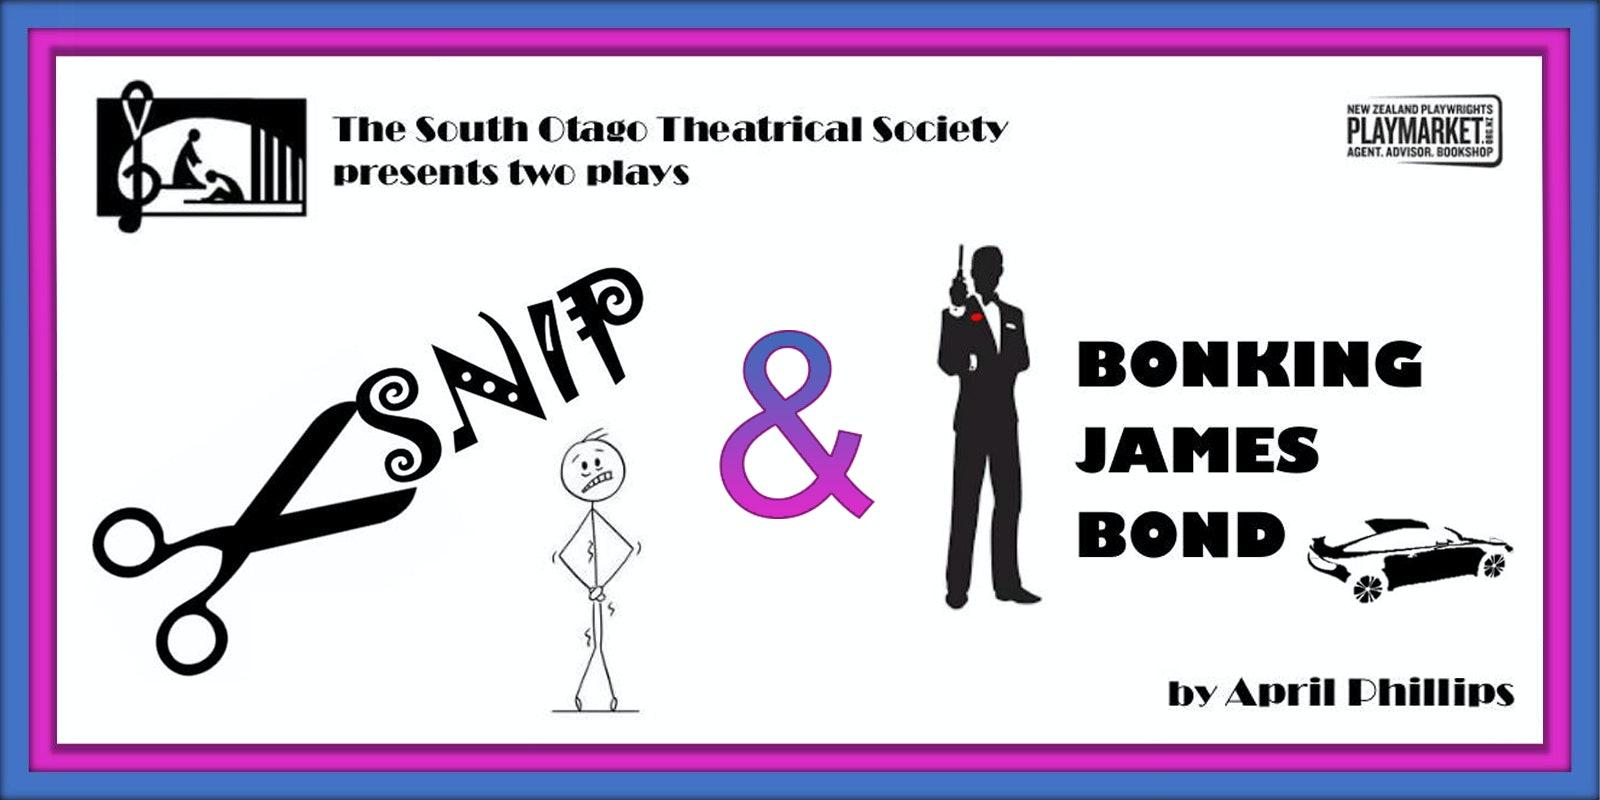 Snip/Bonking James Bond